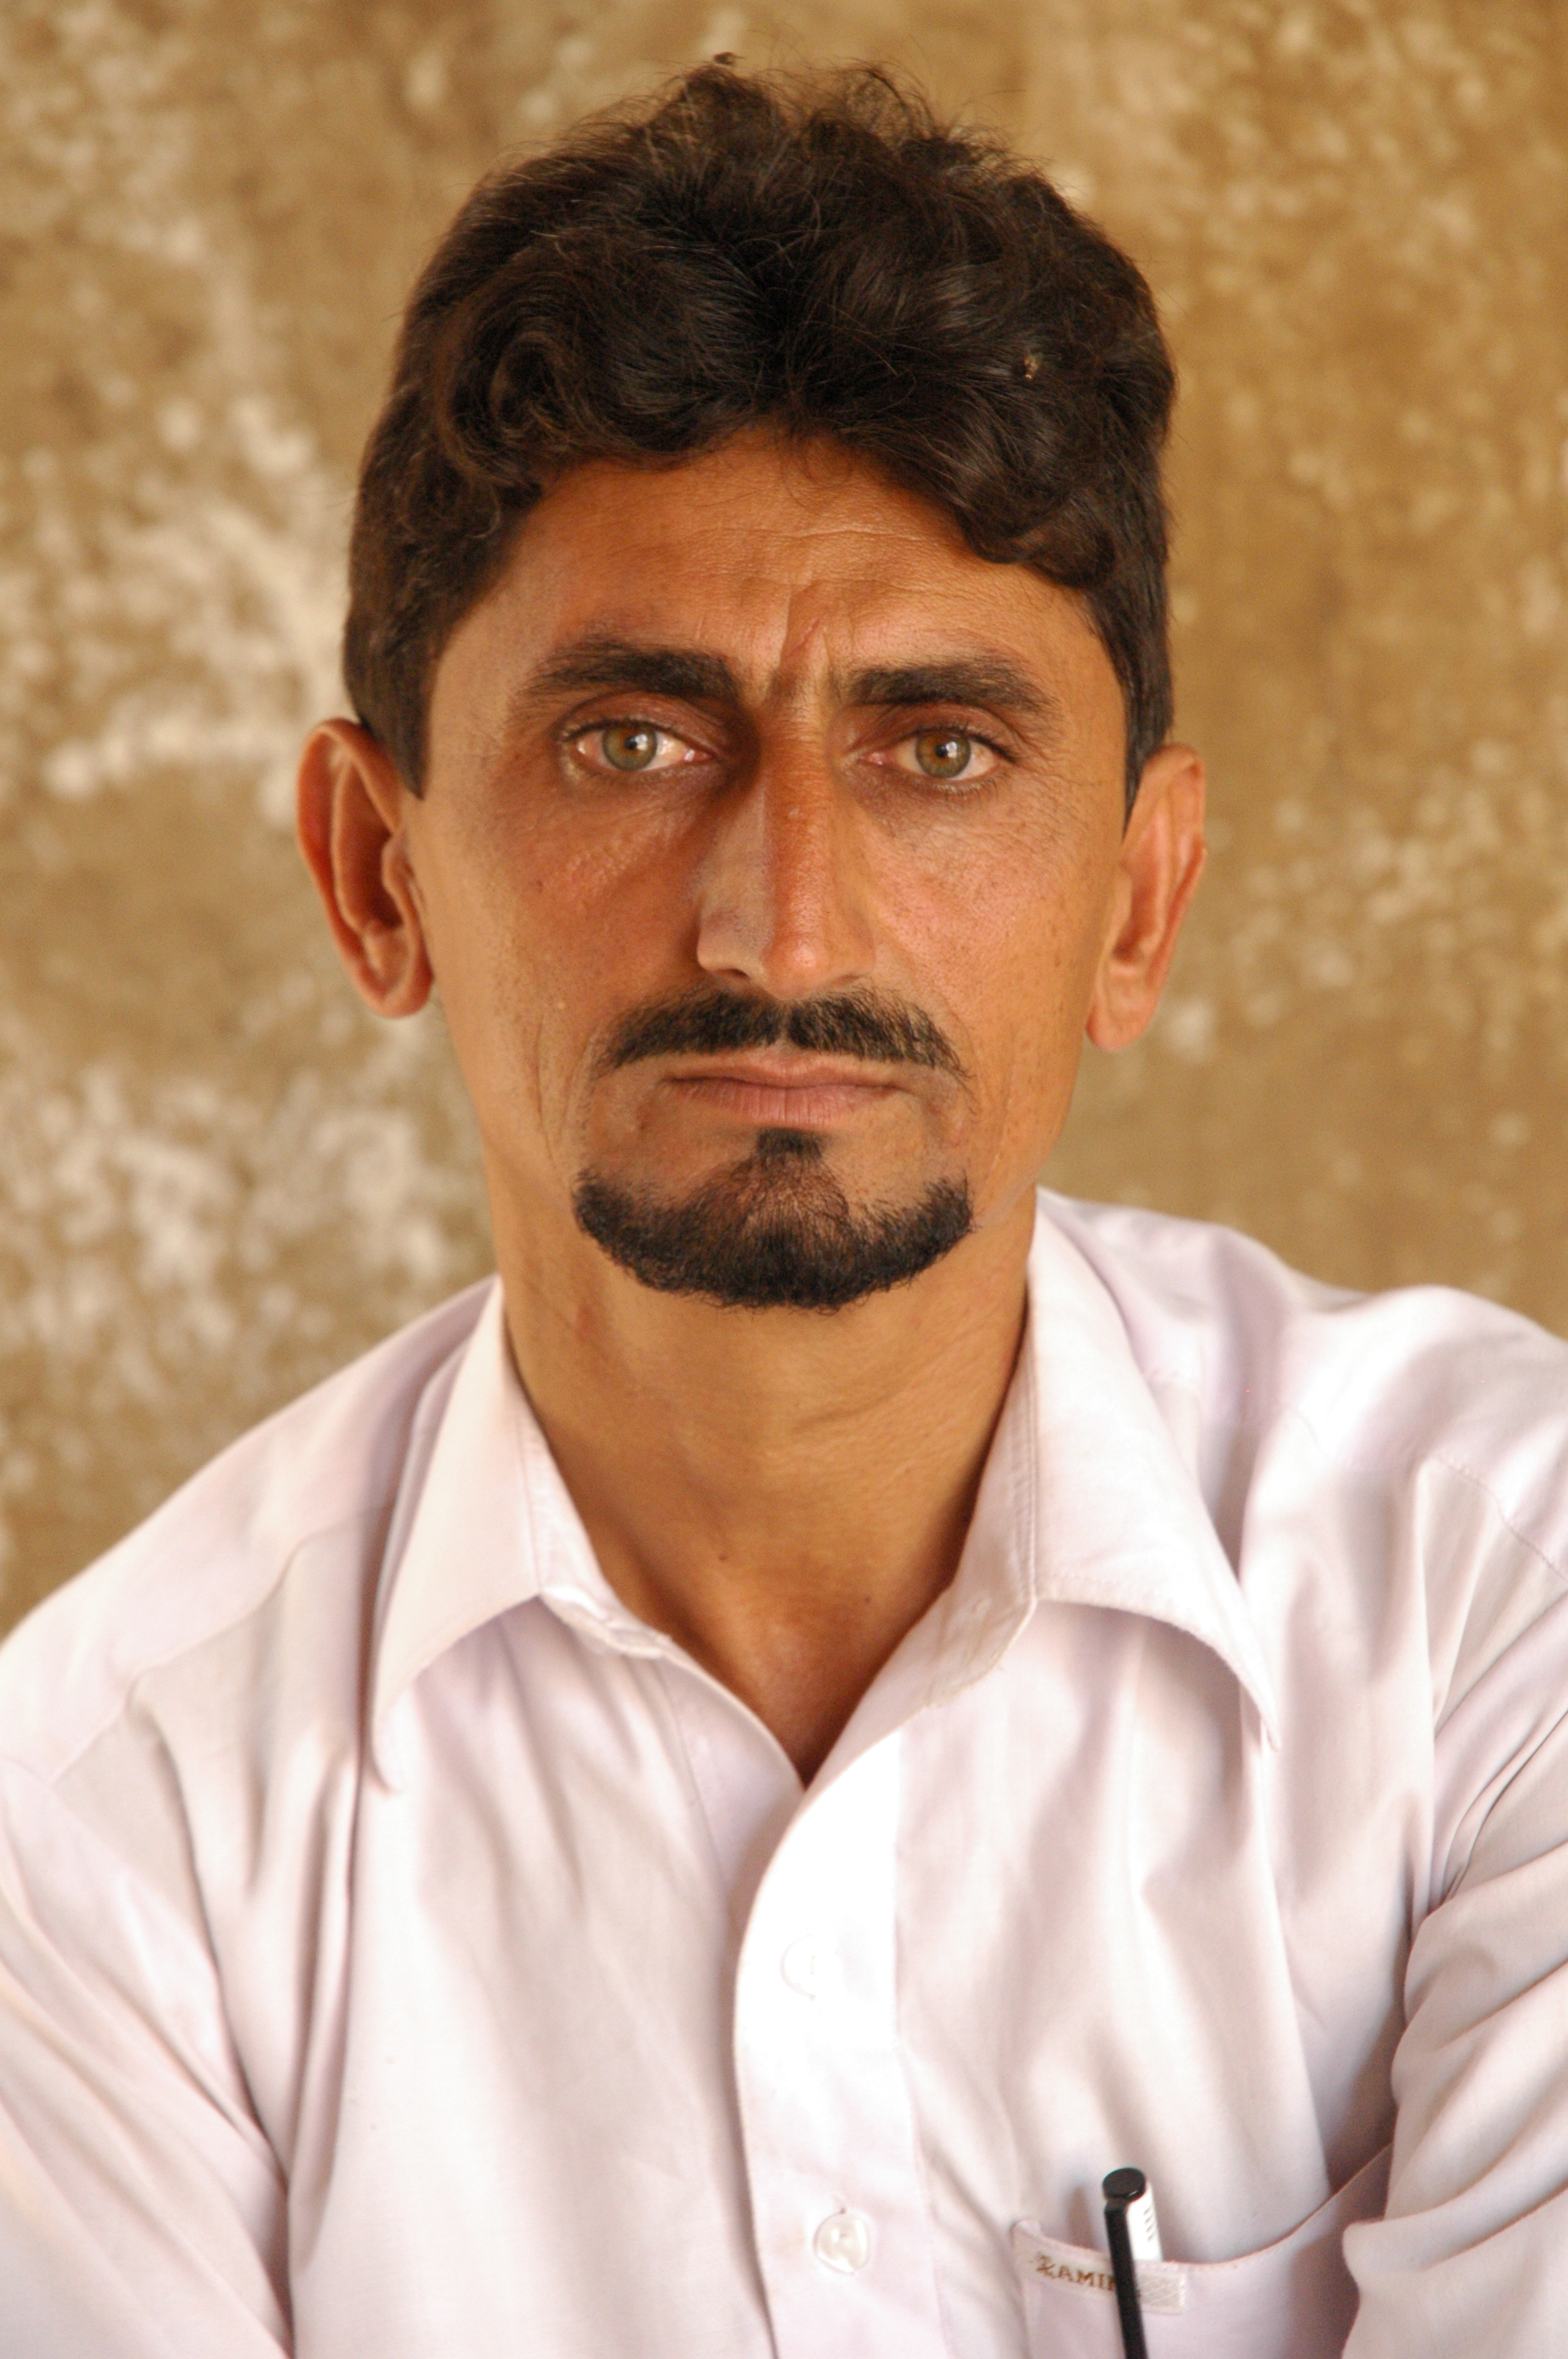 Rafeequl Rehman's mother, Mamana Bibi, was killed in a U.S. drone strike in the village of Ghundi Kala, North Waziristan, Pakistan, on Oct. 24, 2012.